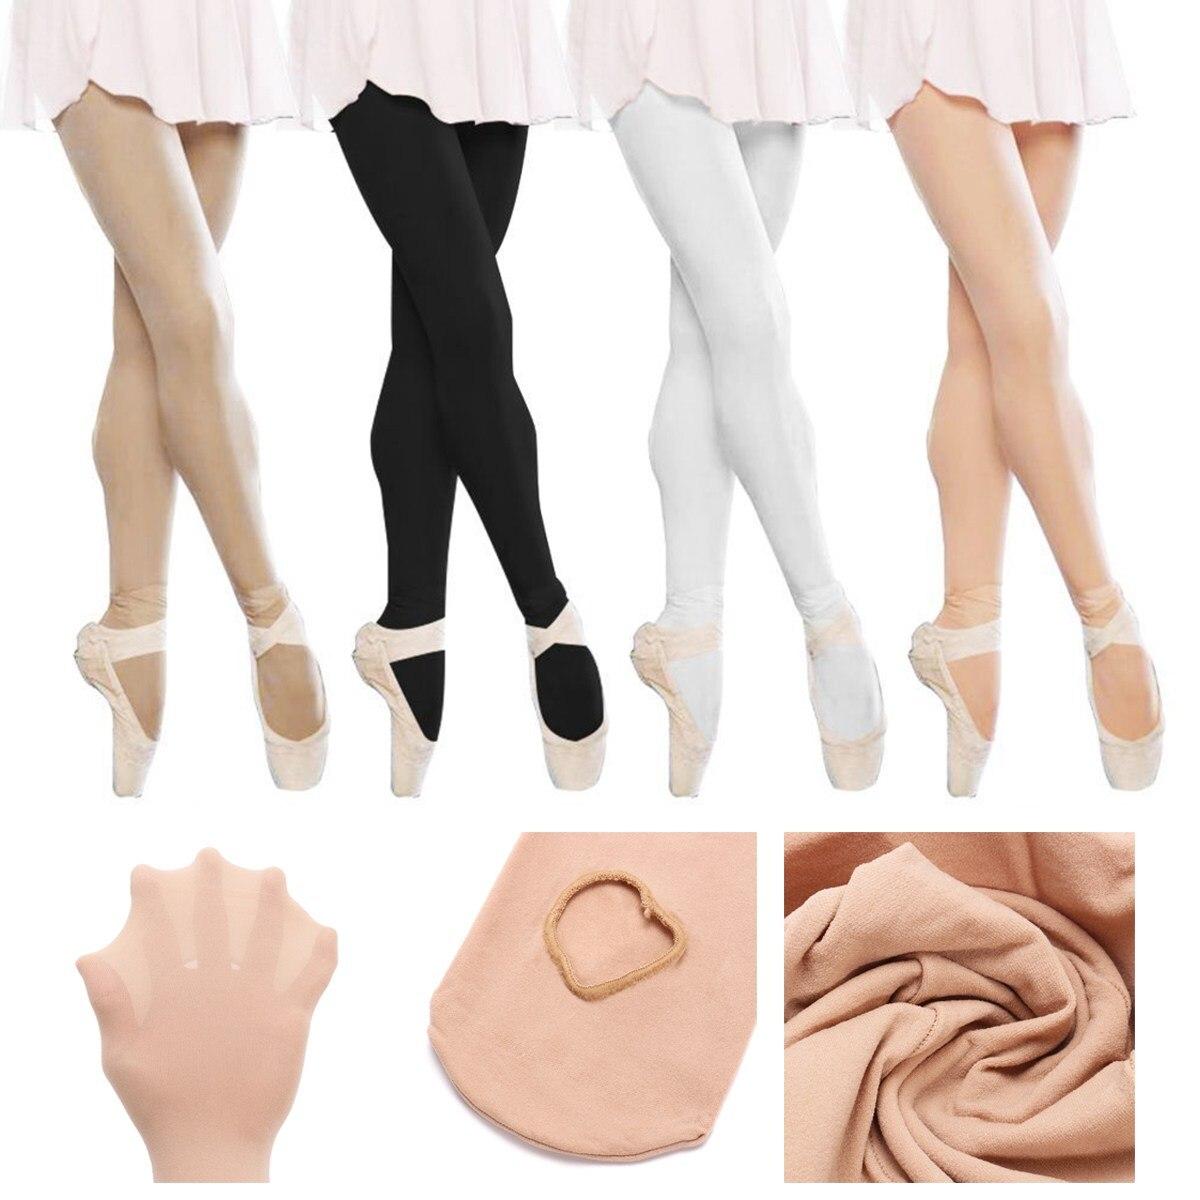 children-girls-convertible-tights-font-b-ballet-b-font-dance-stocking-socks-font-b-ballet-b-font-pantyhose-gymnastics-leotards-kids-ladies-tap-dance-tights